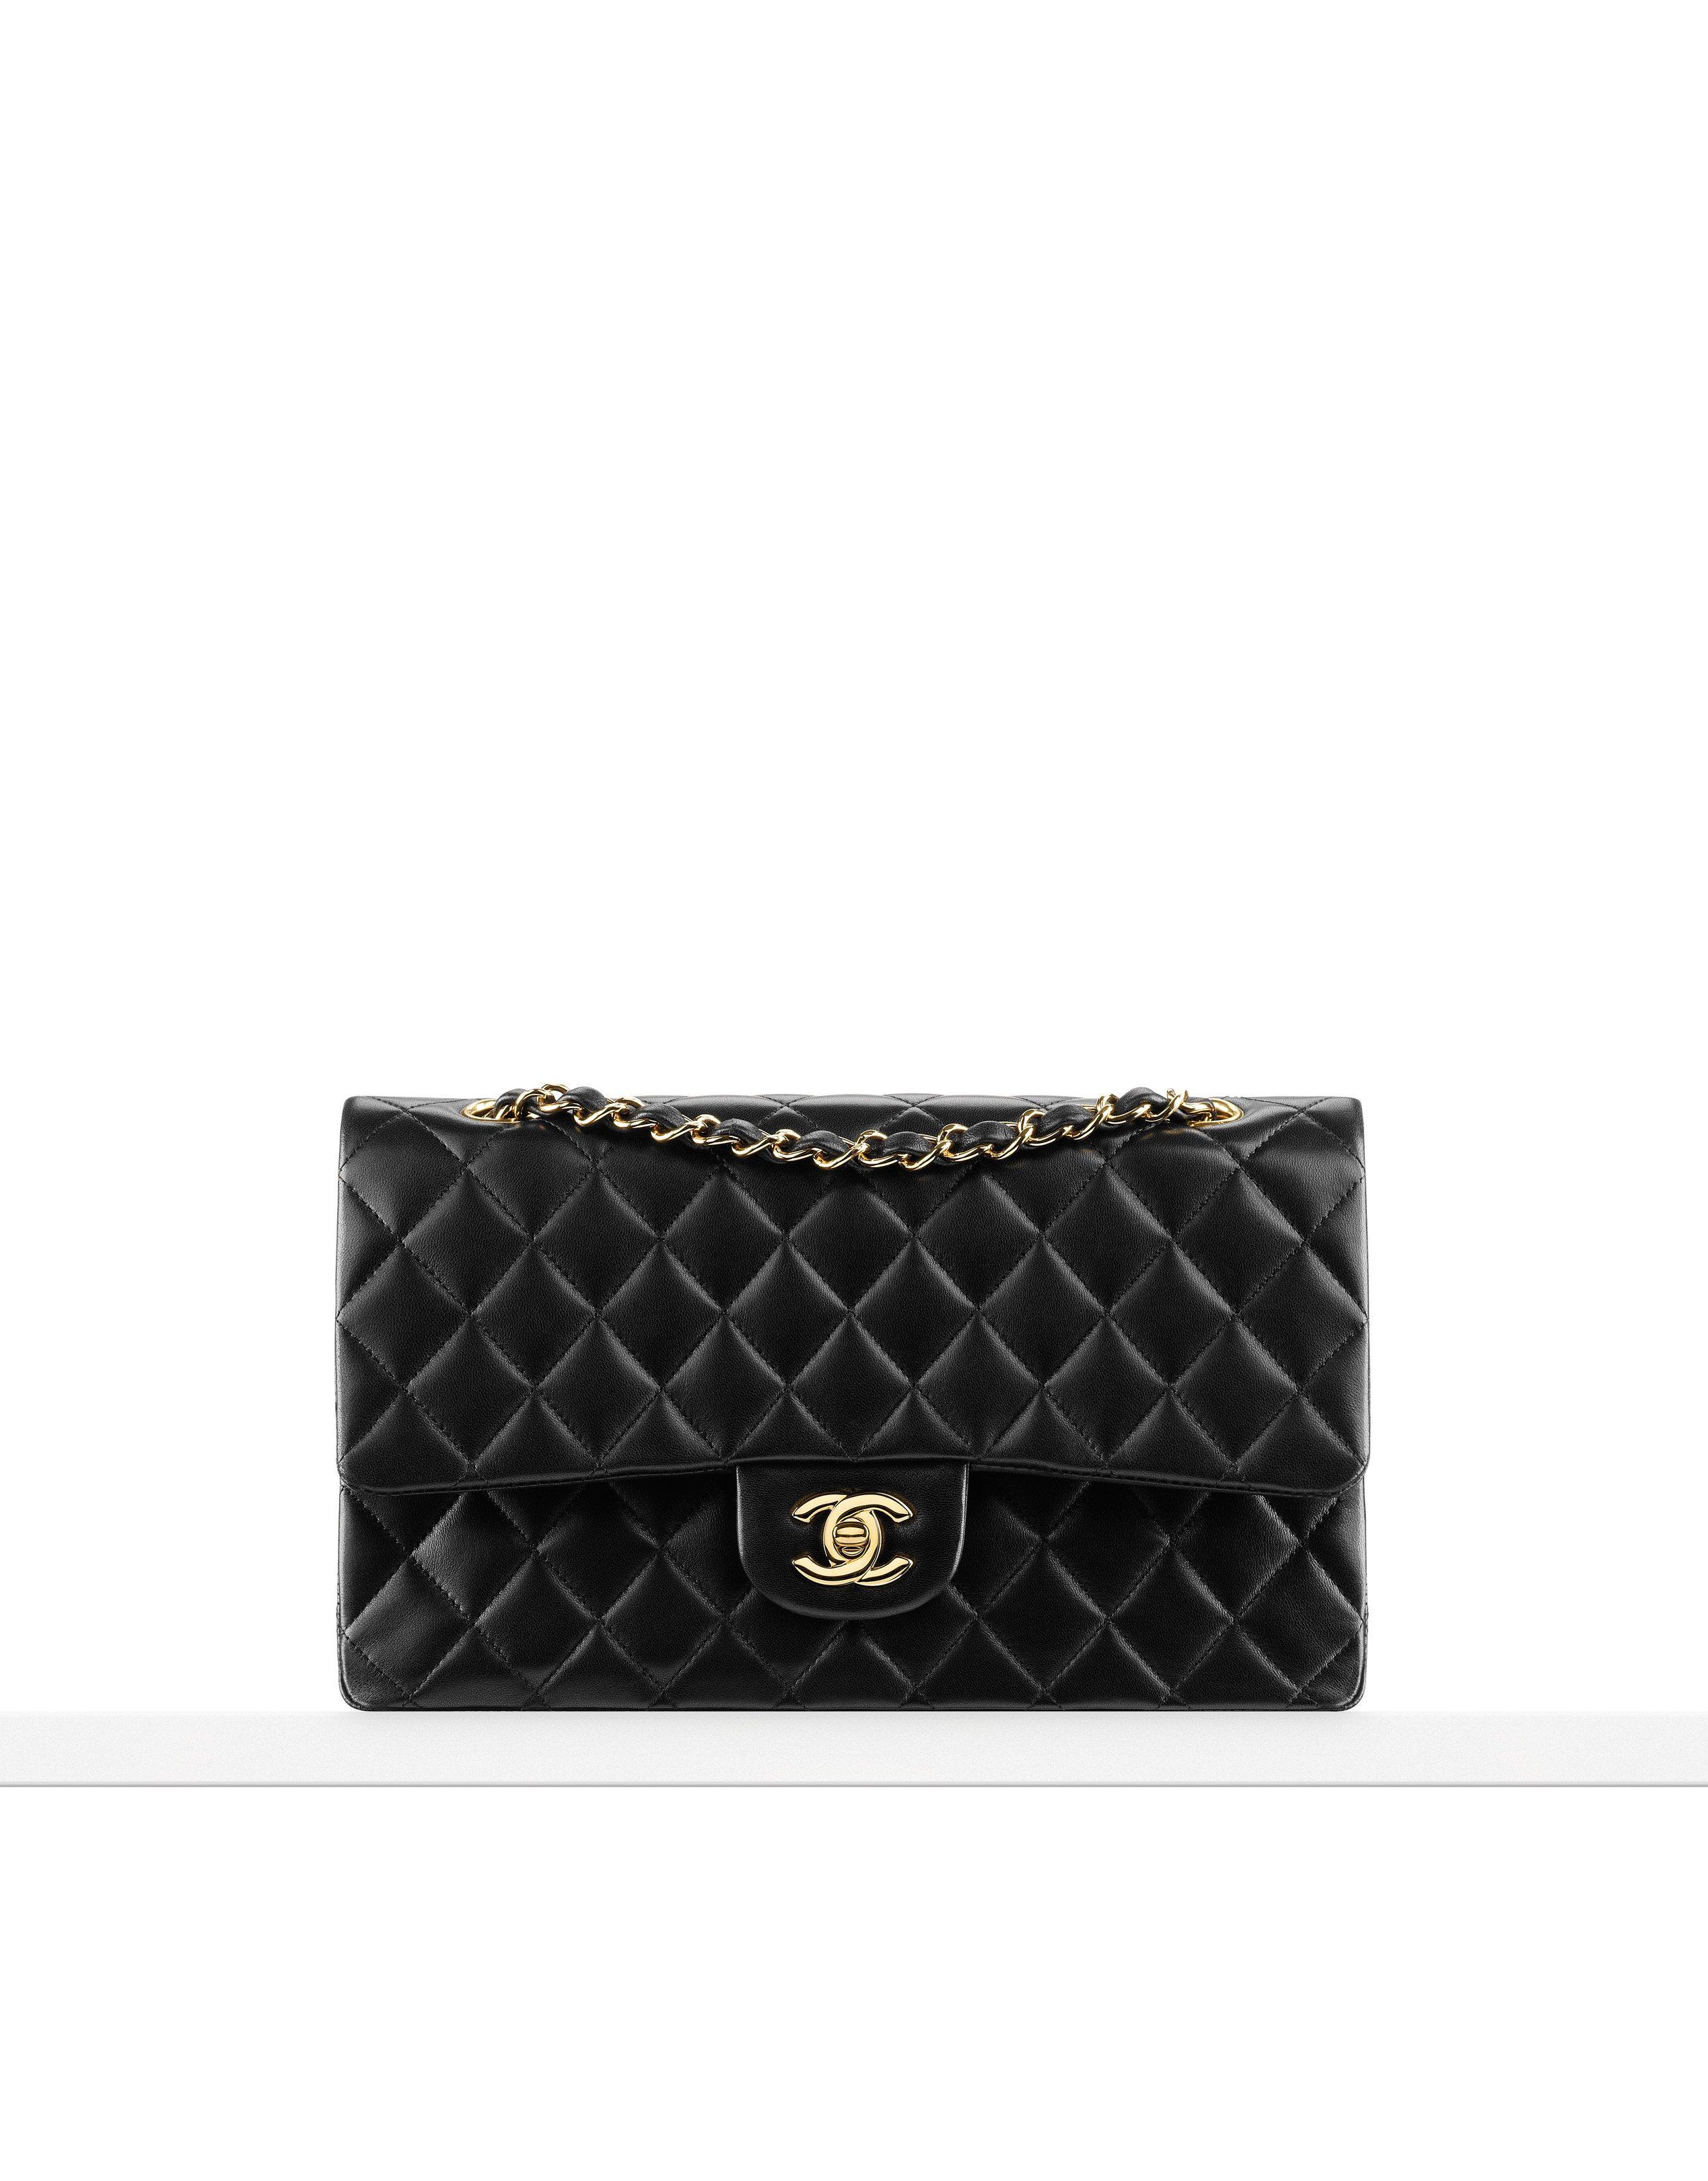 Sac Classique Timeless Moyen En Agneau Matelasse Chanel 3 3